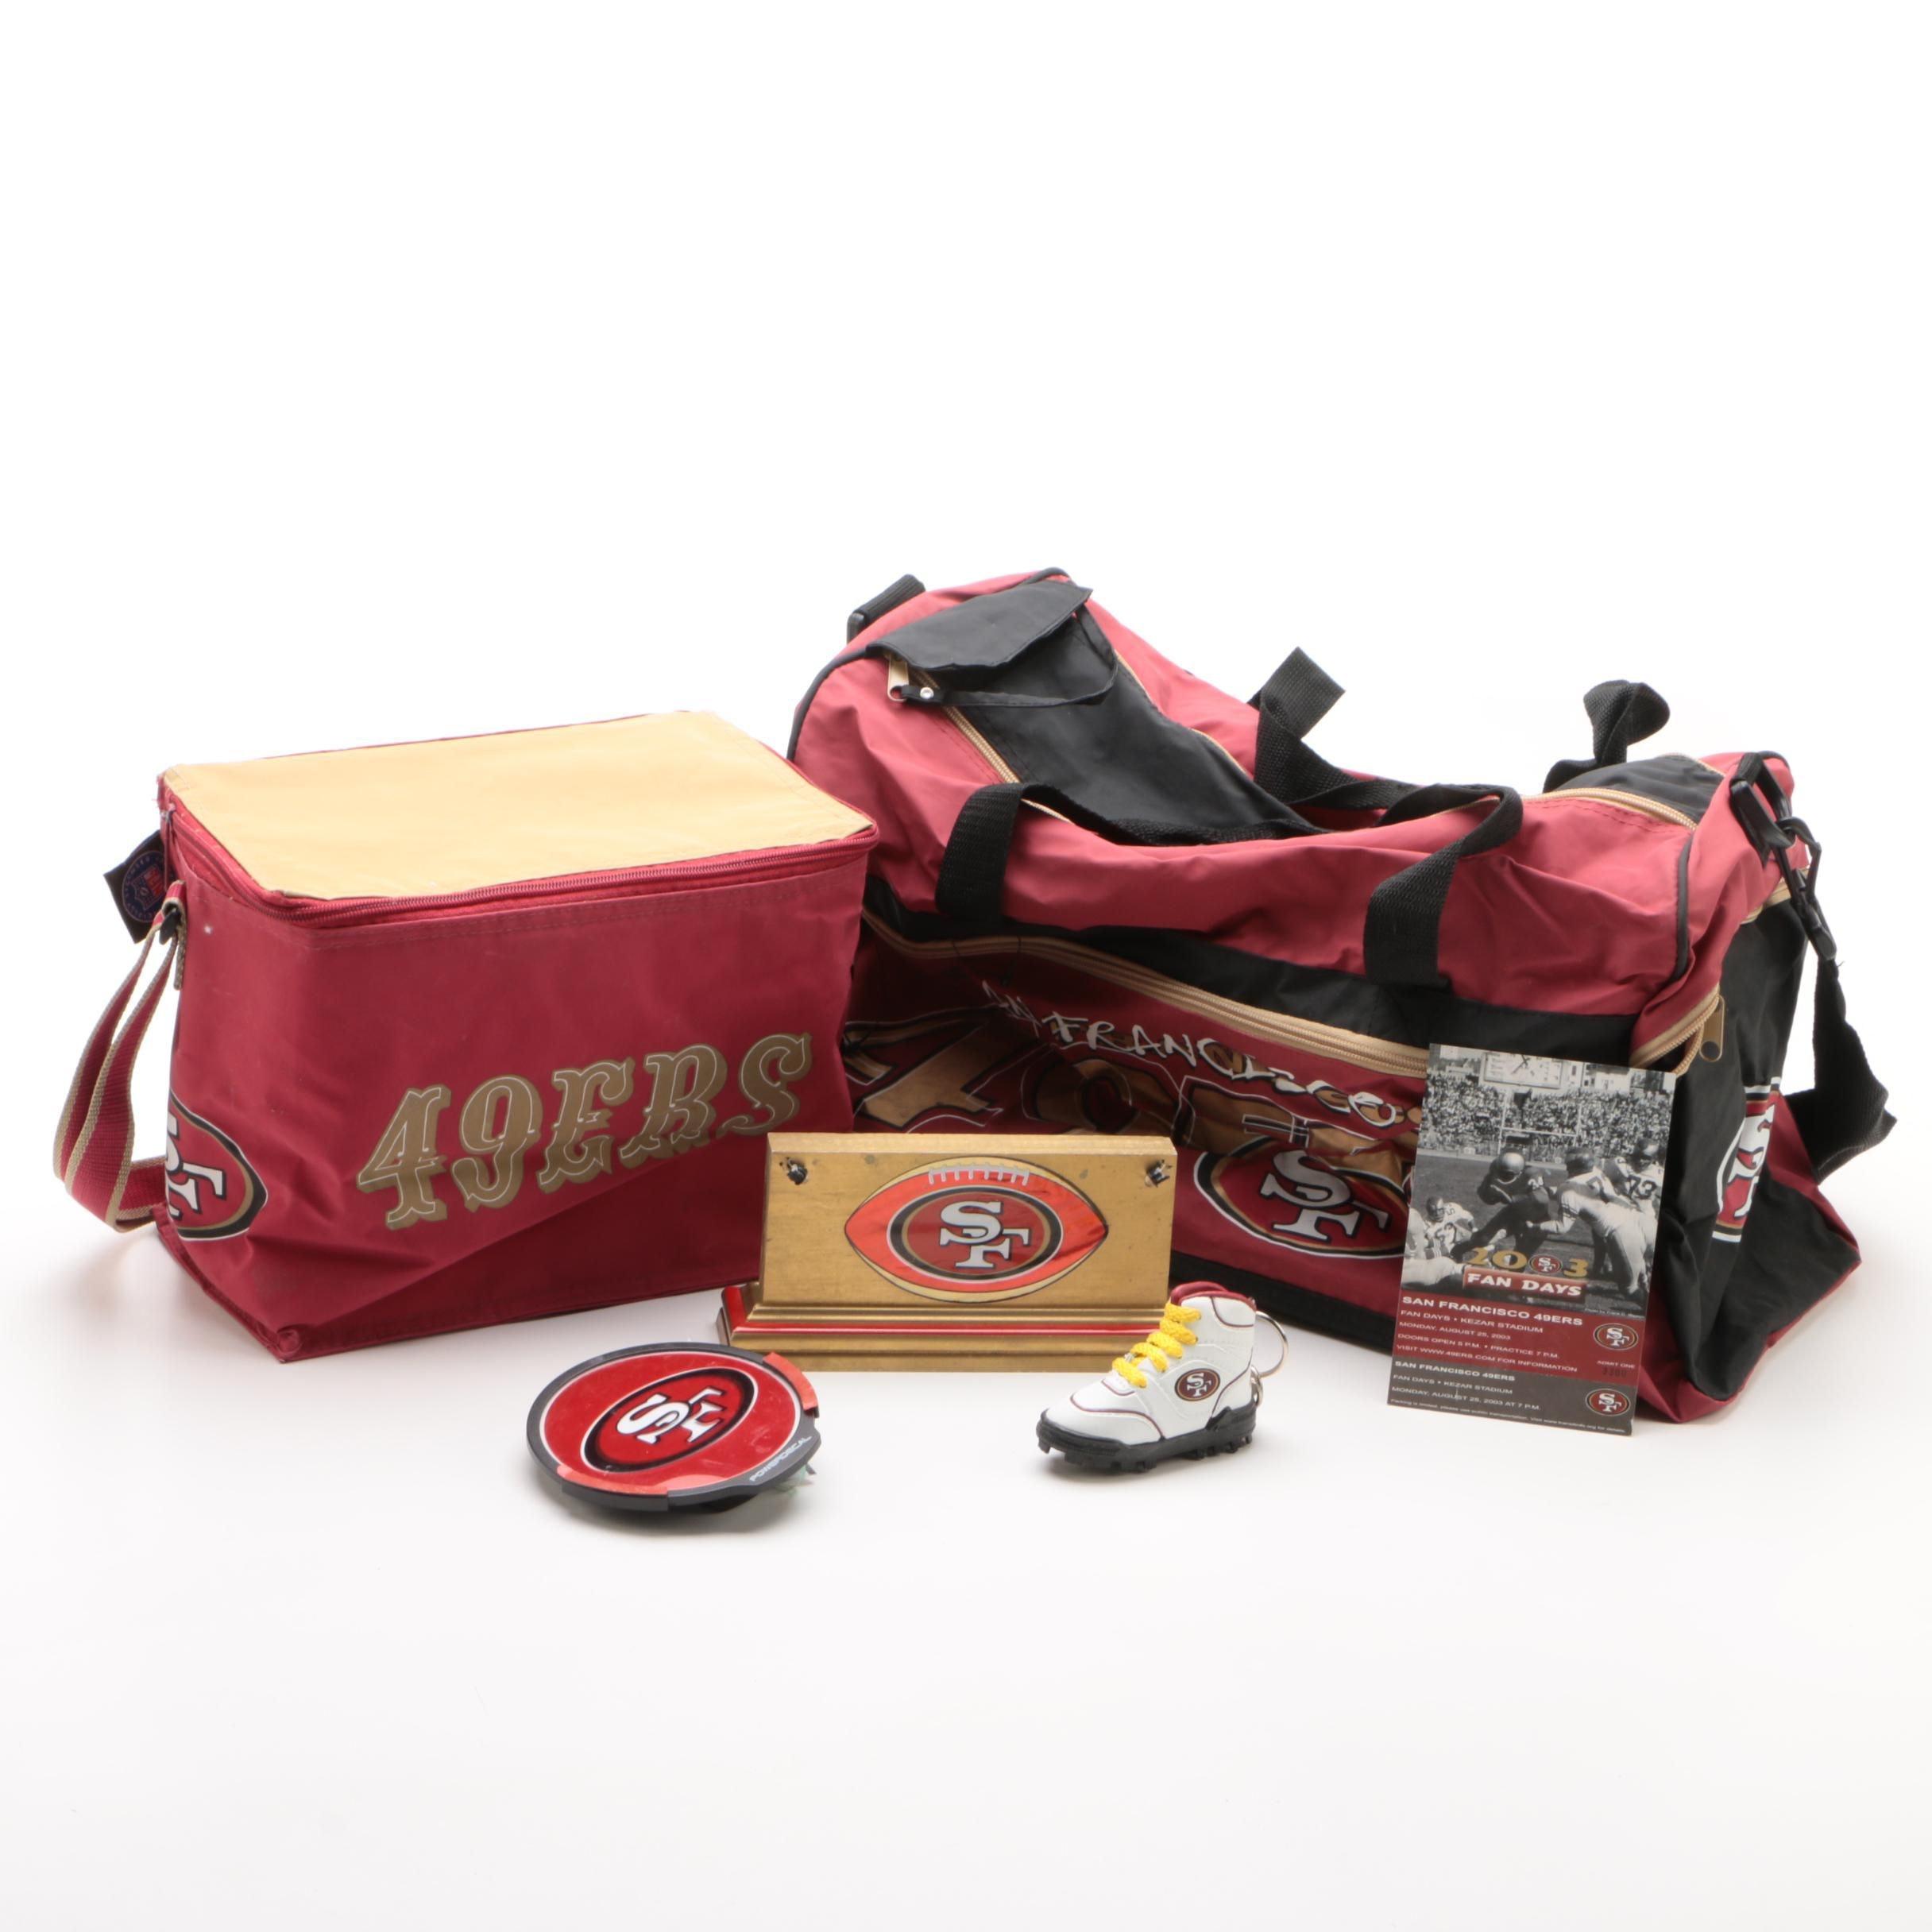 San Francisco 49ers Duffel Bags and Other Memorabilia